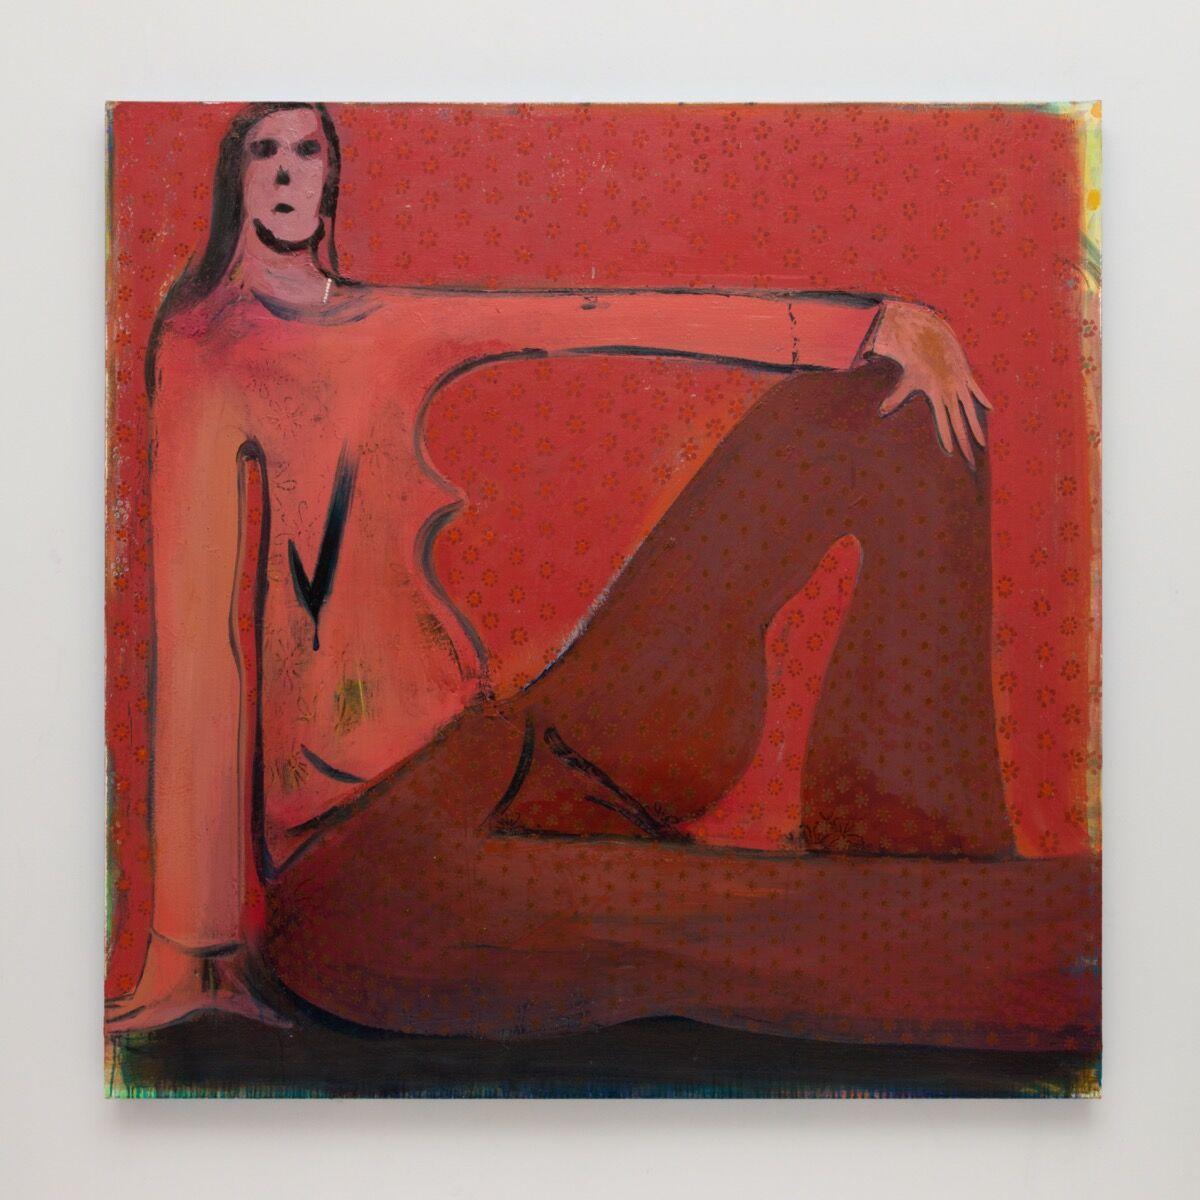 Heidi Hahn, Folded Venus / Pomaded Sweater #5, 2020. Courtesy of the artist and Nathalie Karg Gallery.